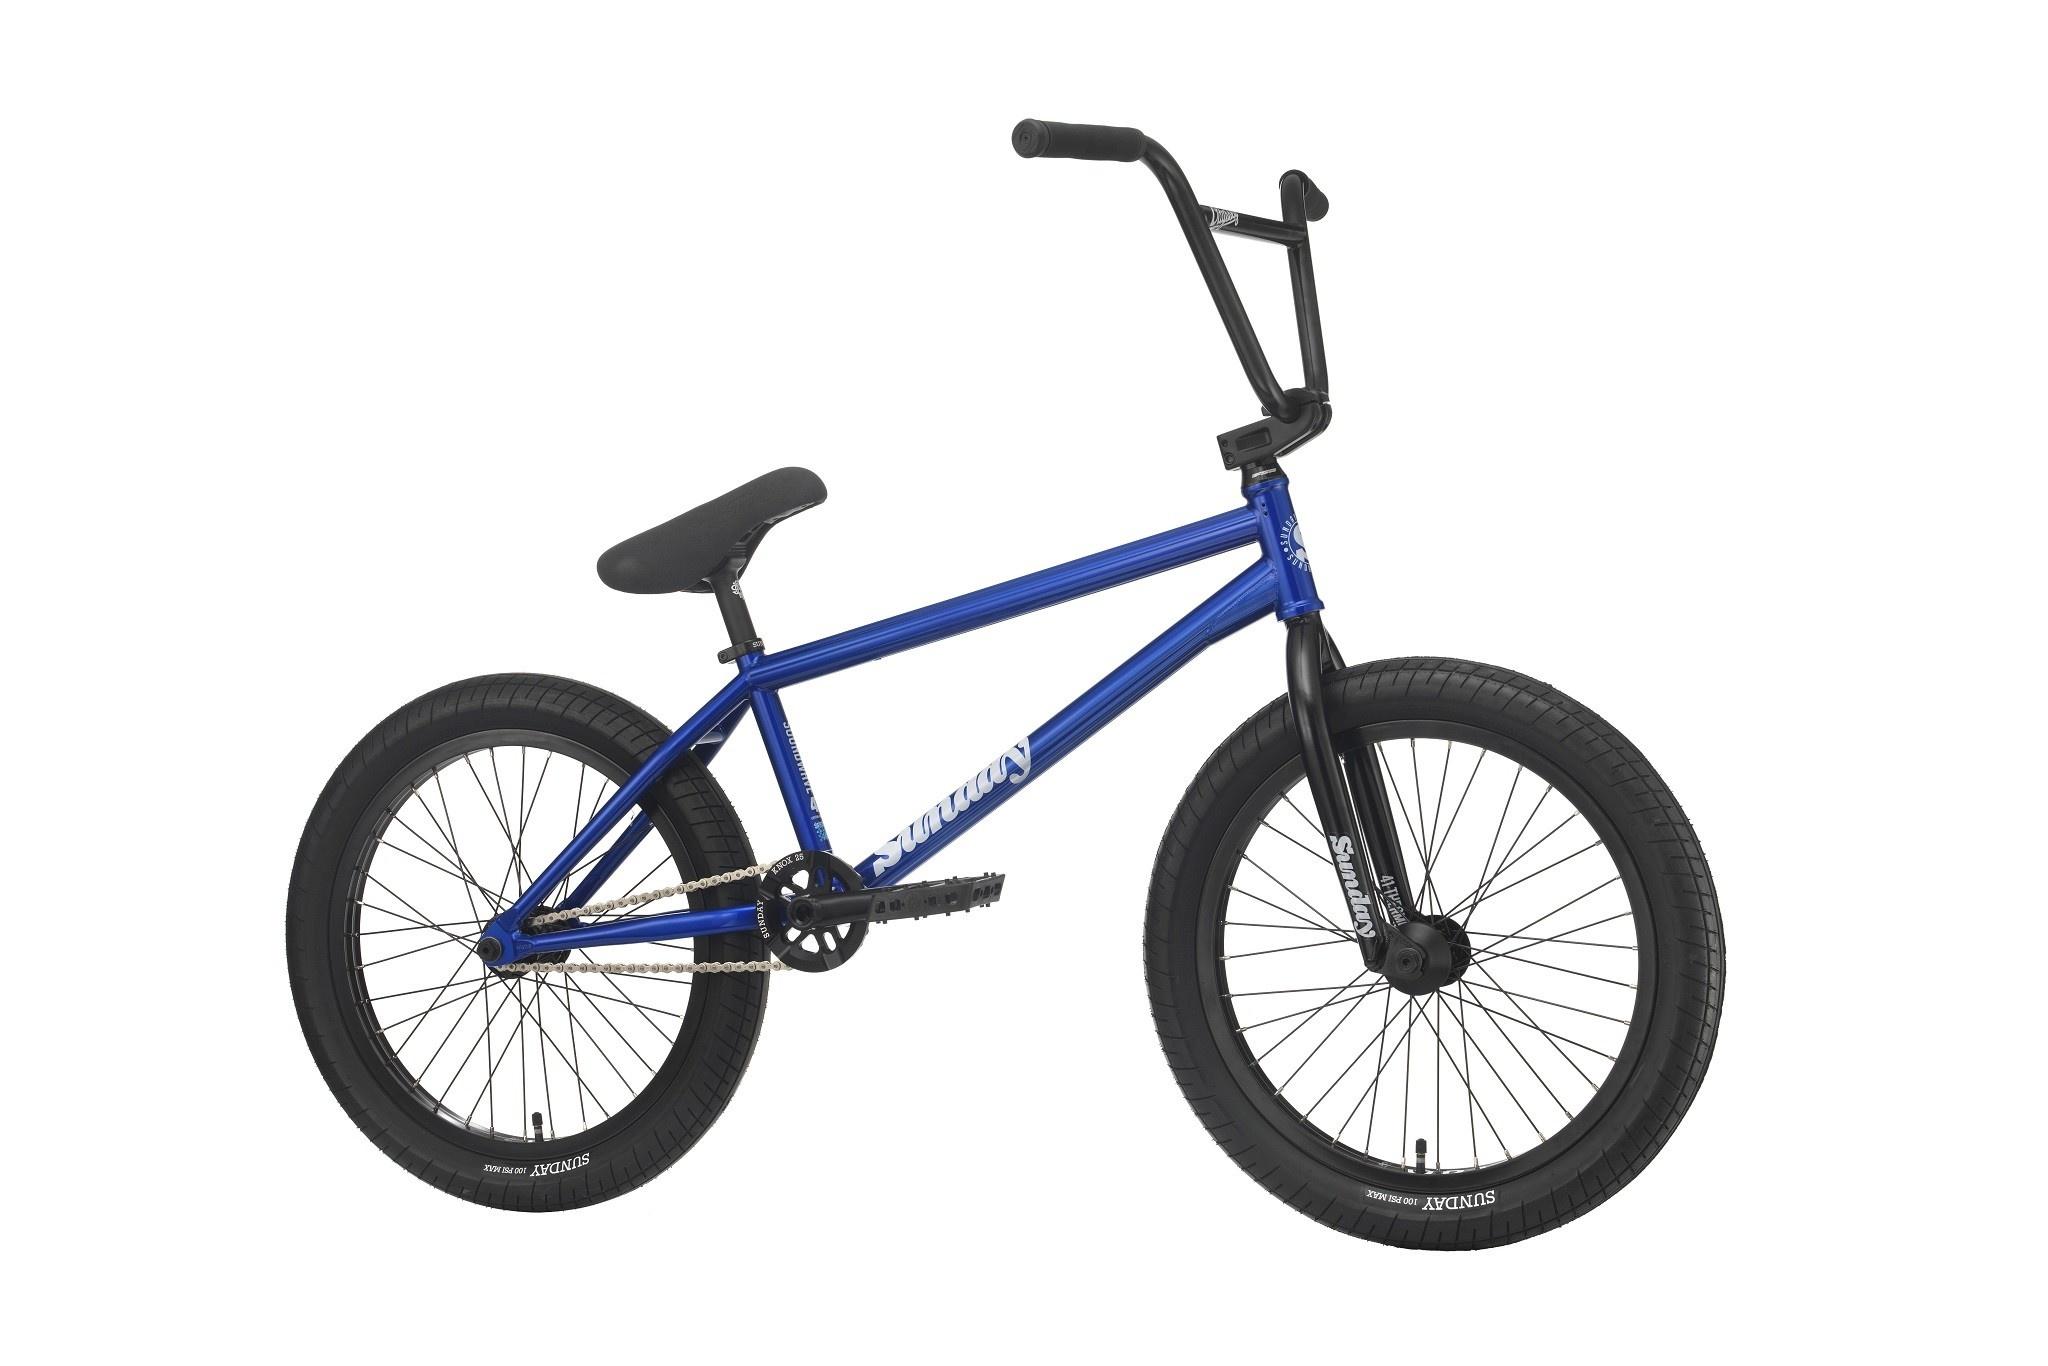 Sunday 2020 Sunday Soudwave Special 21' Candy Blue RHD Bike